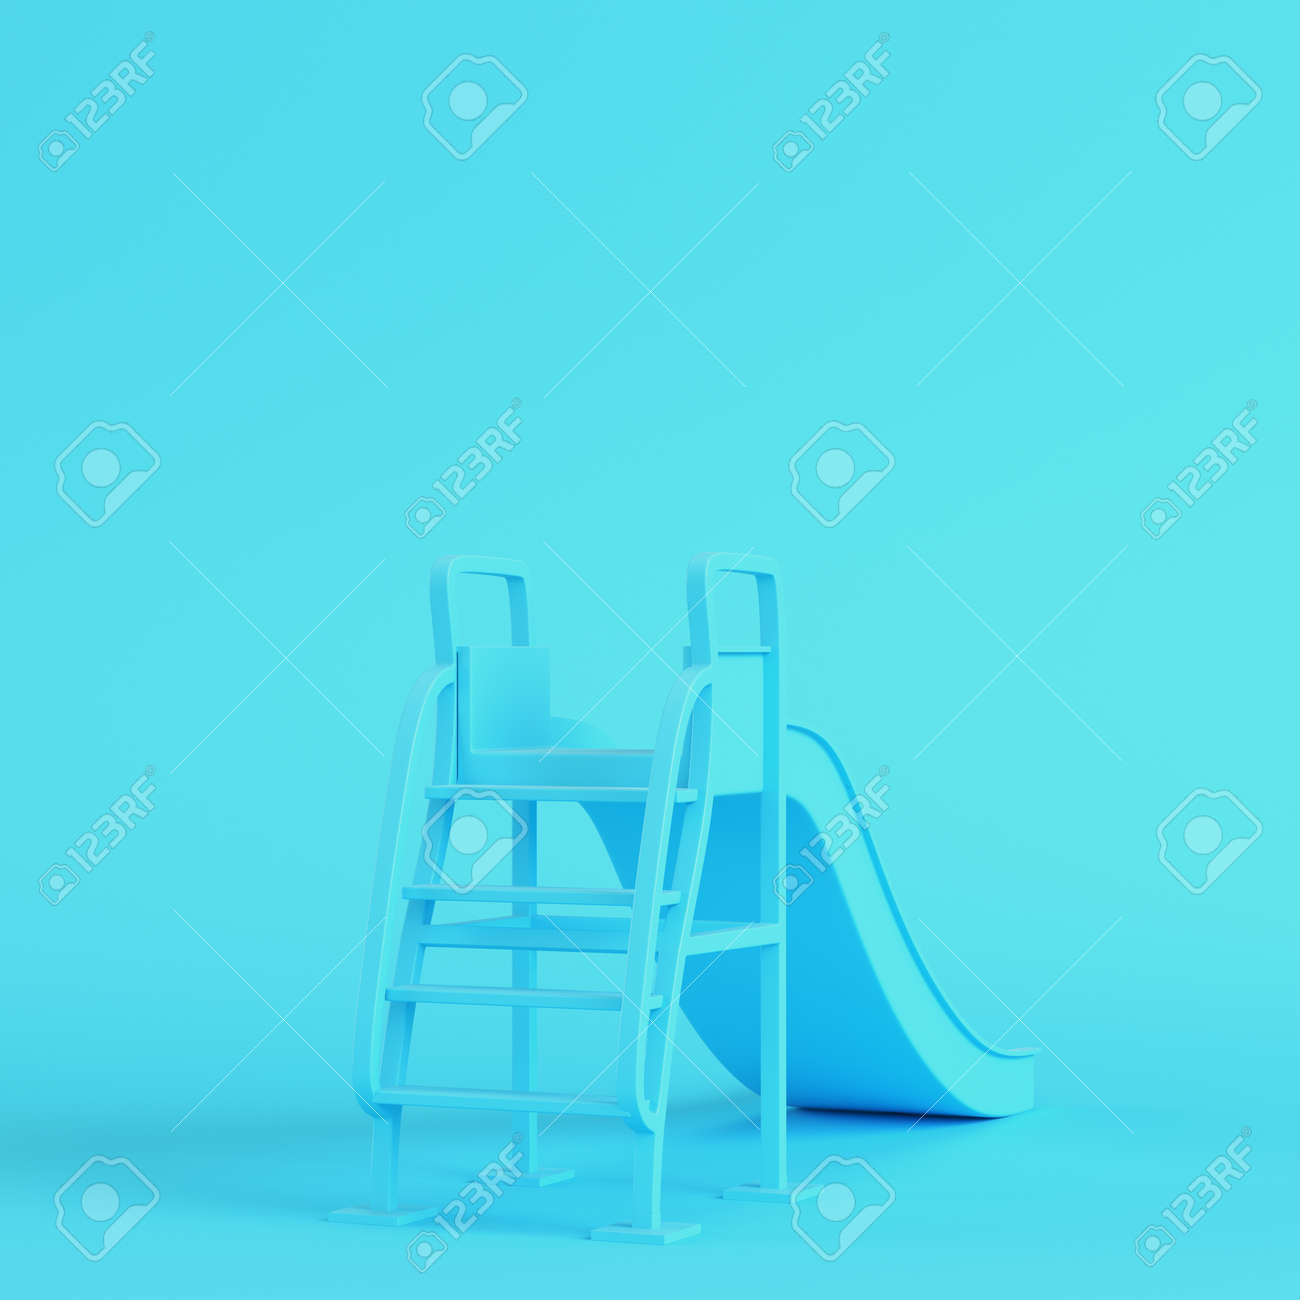 Children slide on bright blue background in pastel colors. Minimalism concept. 3d render - 170609729